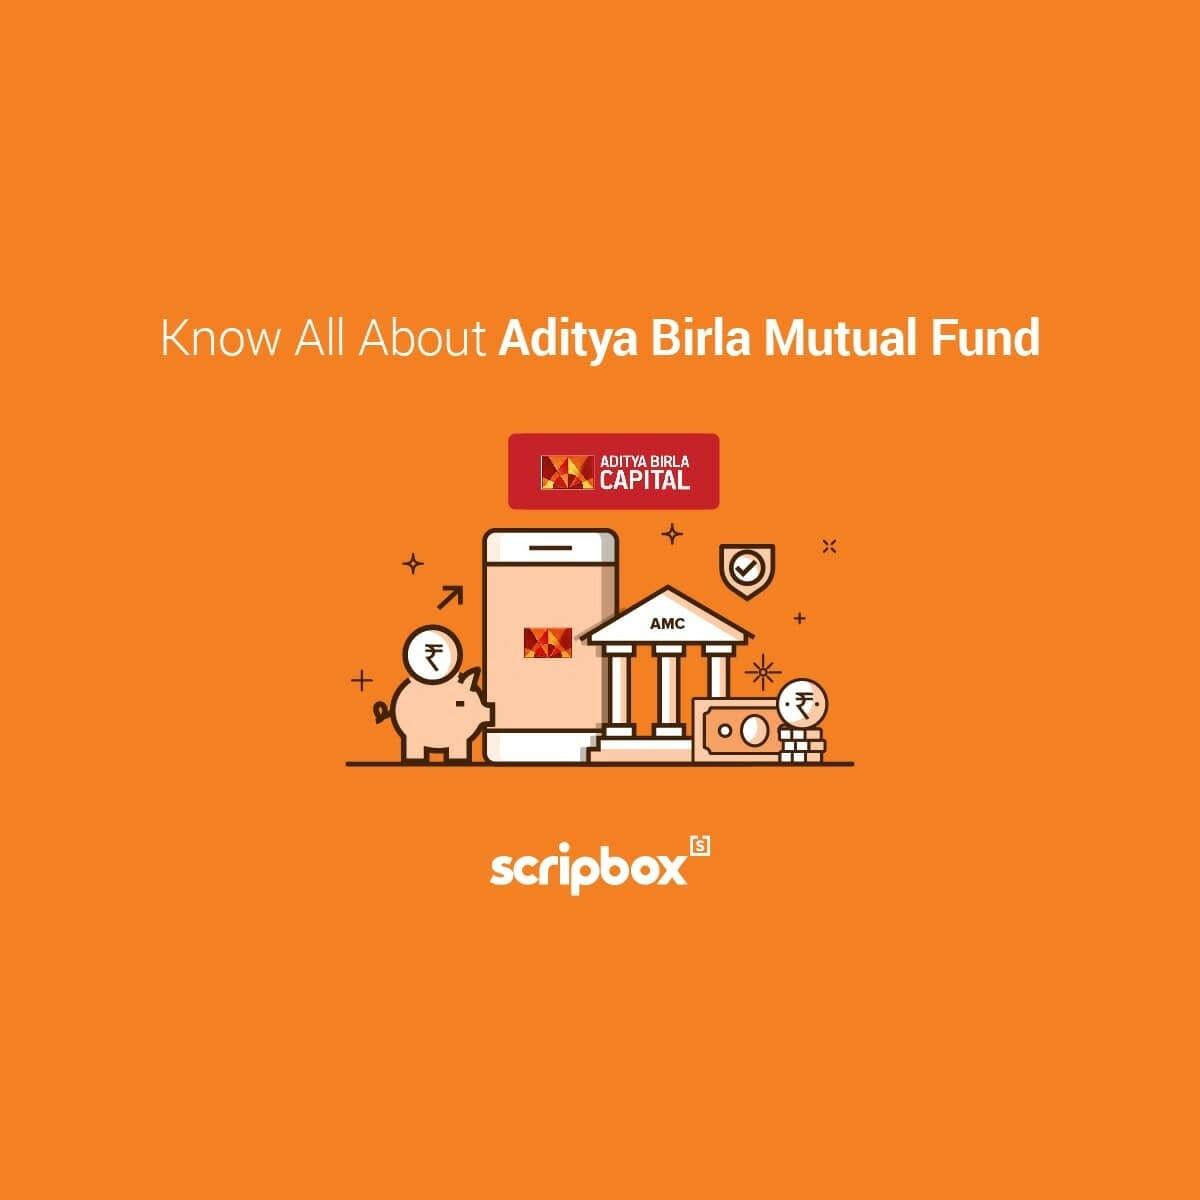 aditya birla mutual fund